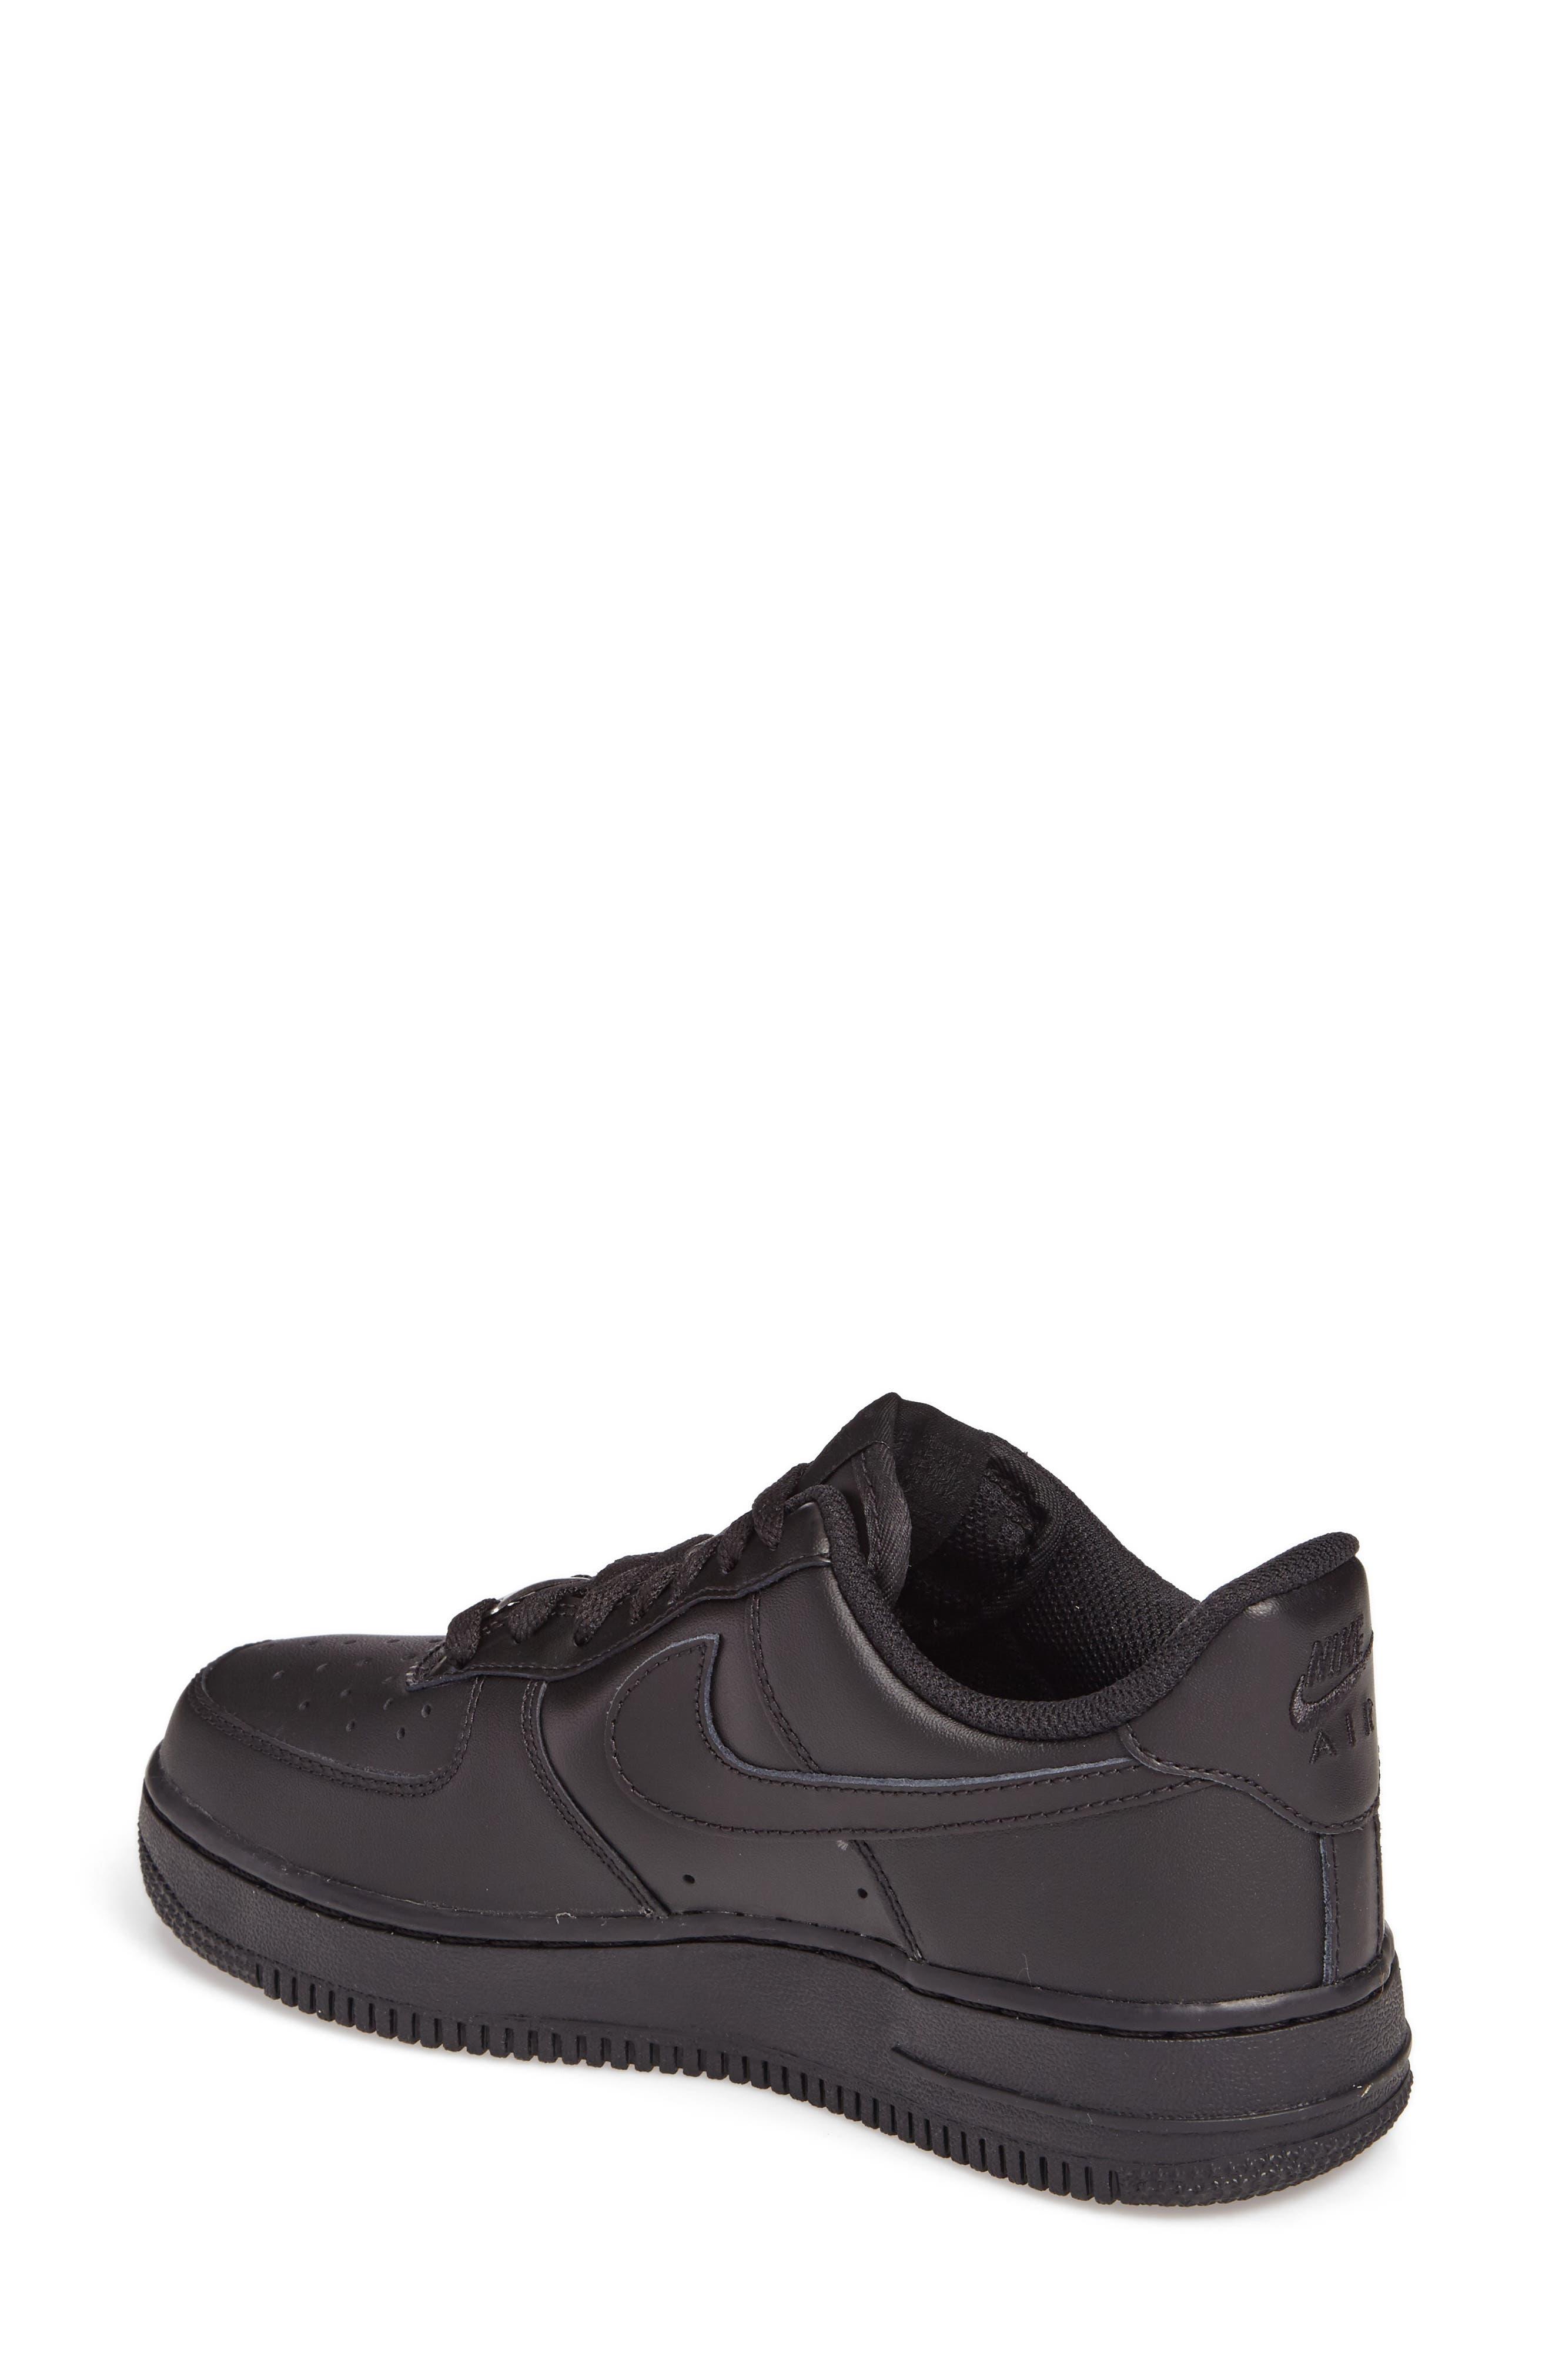 NIKE, 'Air Force 1' Basketball Sneaker, Alternate thumbnail 2, color, BLACK/ BLACK